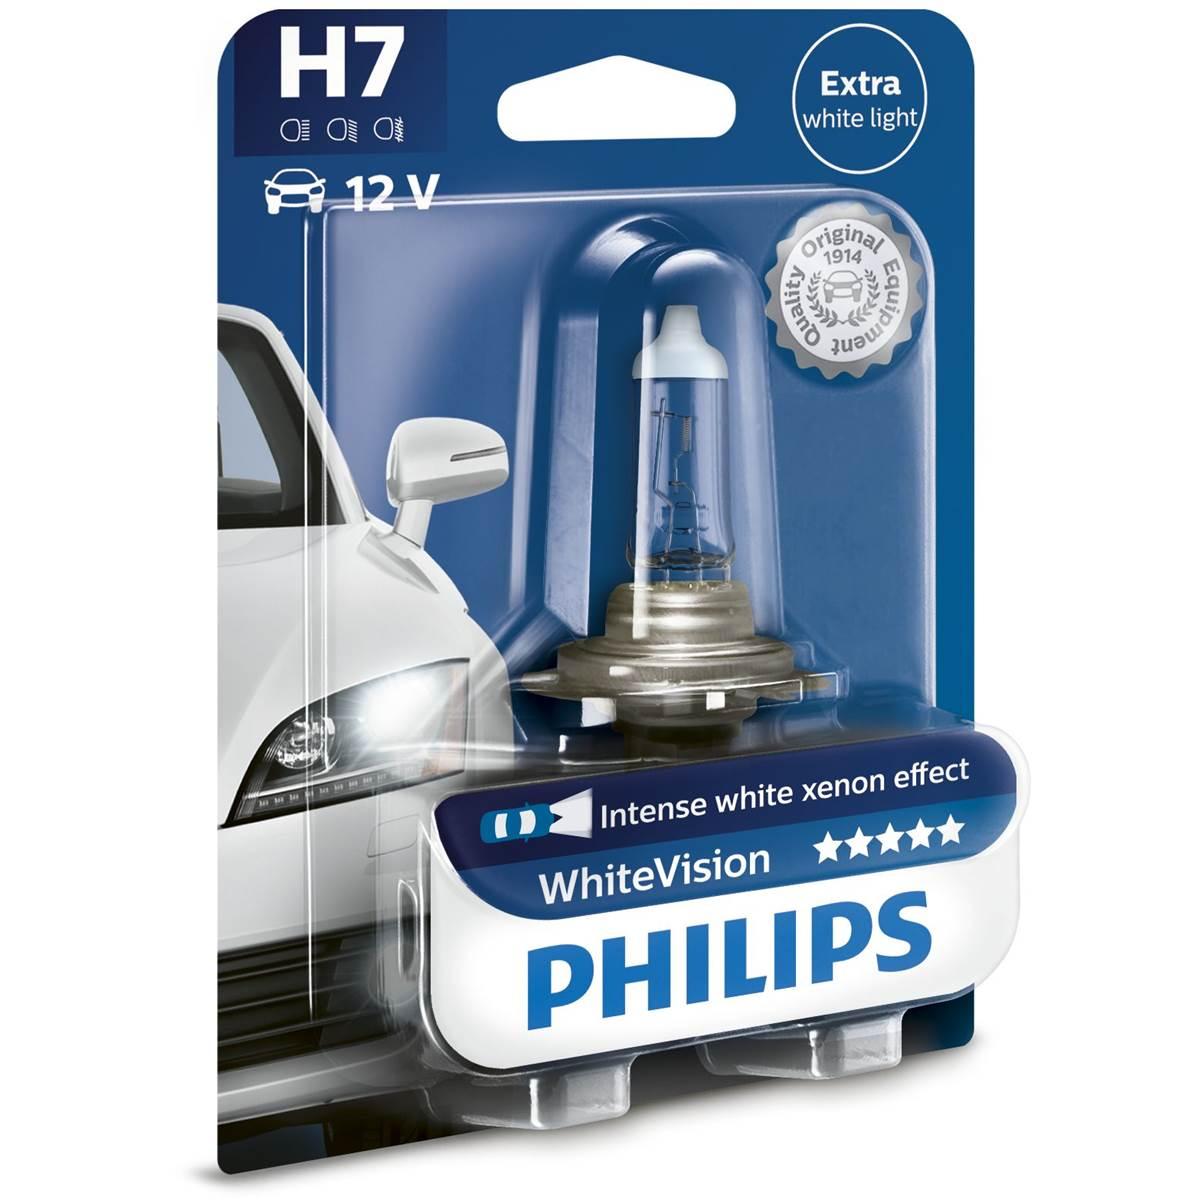 ampoule h7 philips. Black Bedroom Furniture Sets. Home Design Ideas